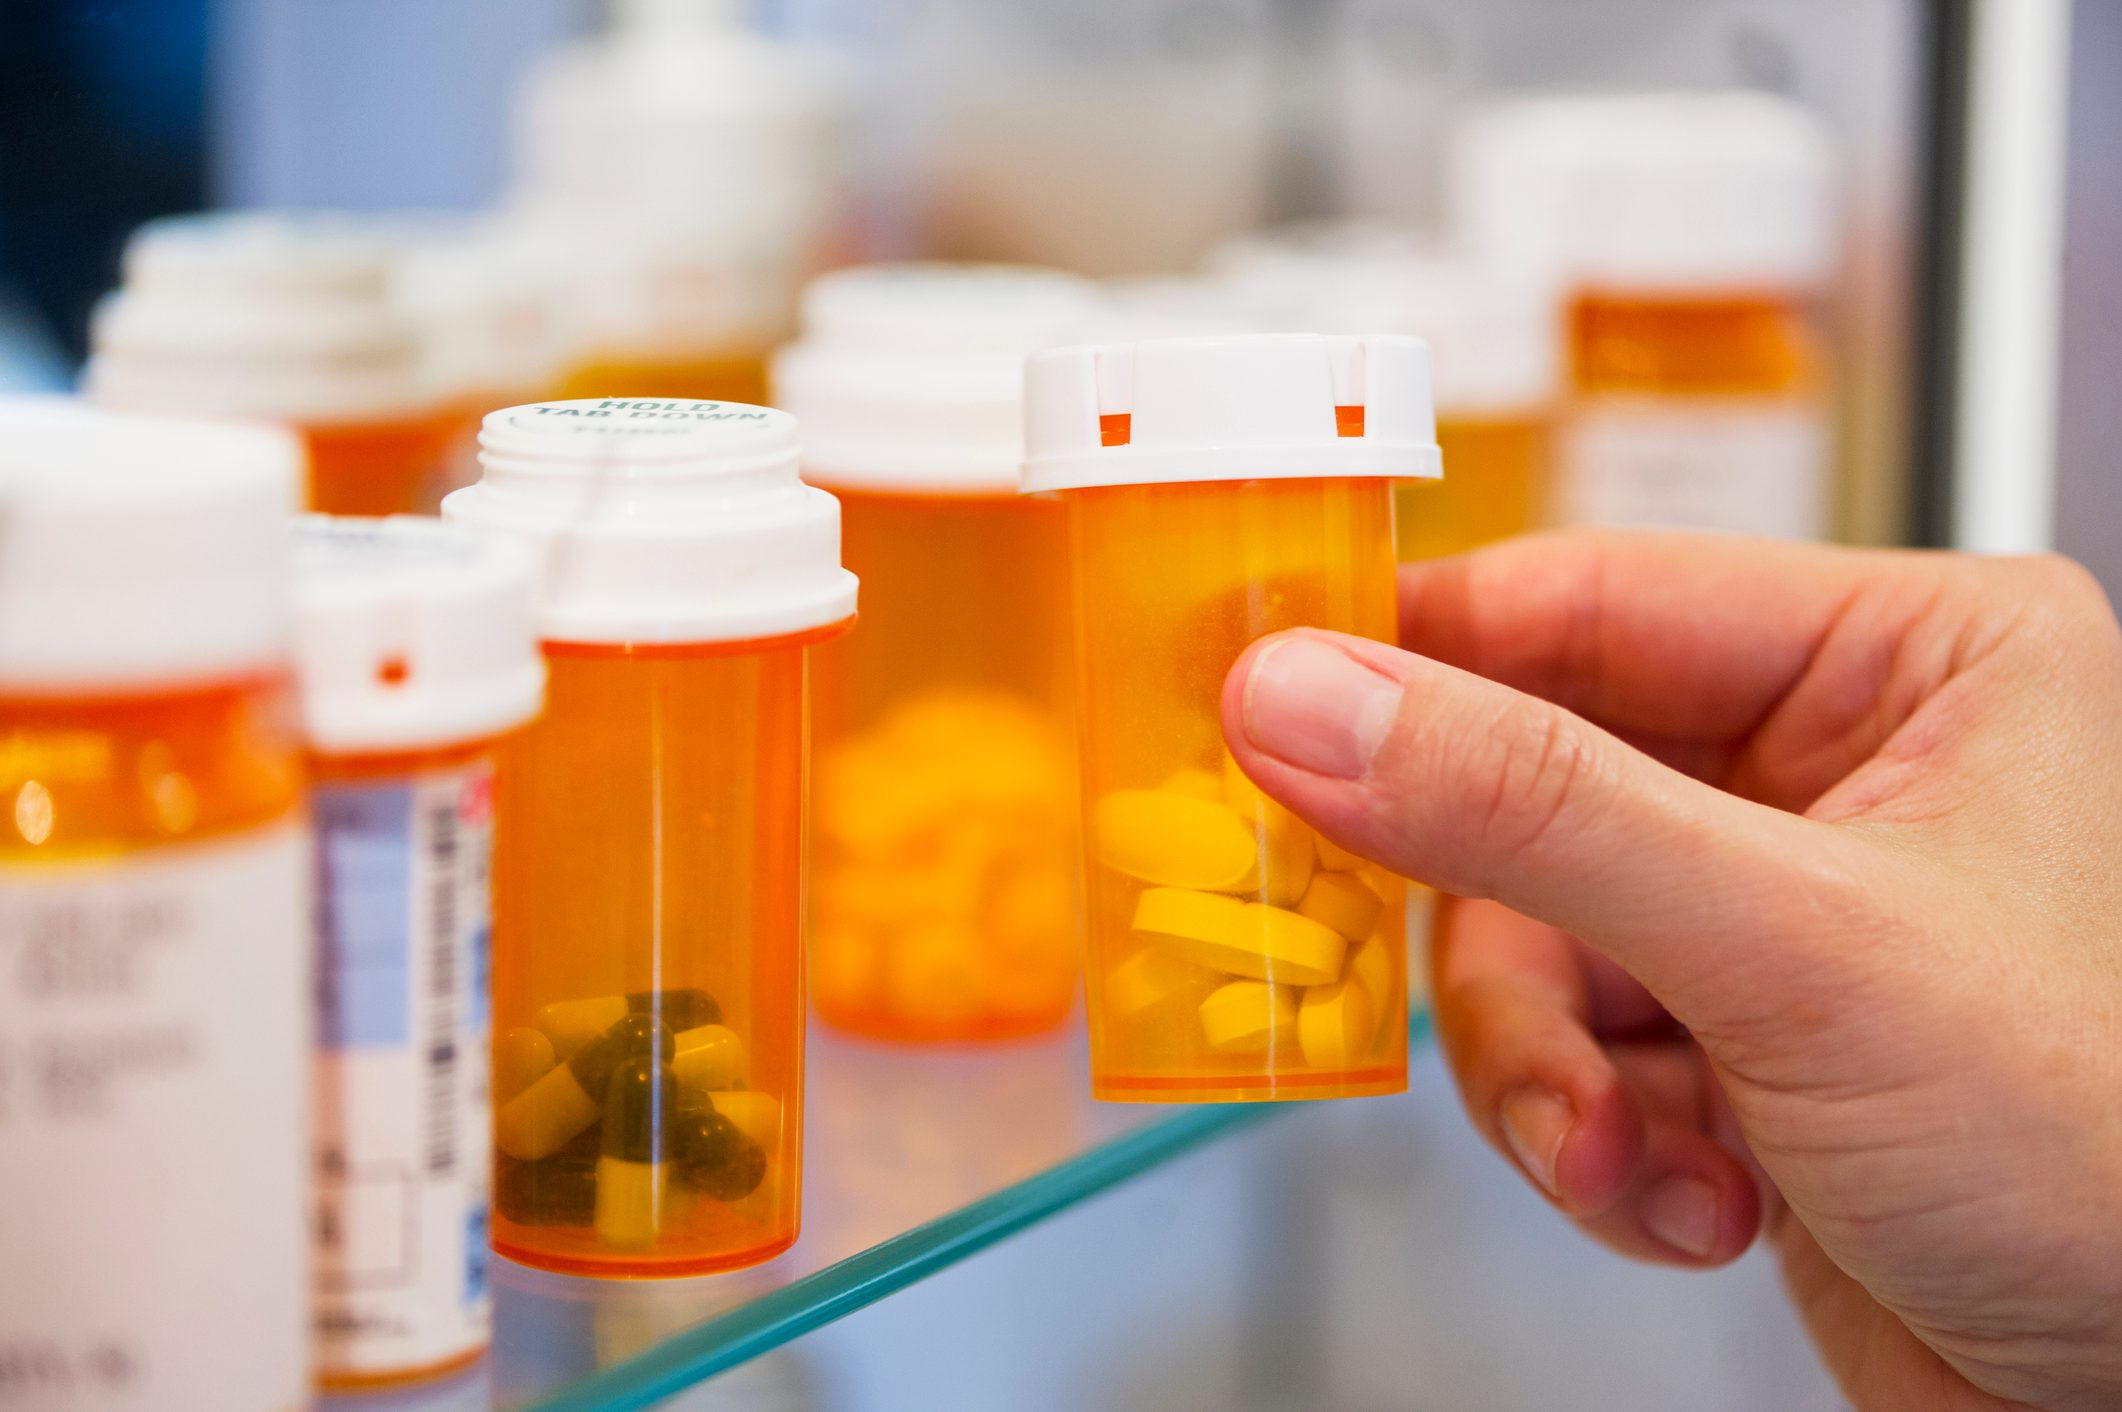 prescription pill bottles in medicine cabinet